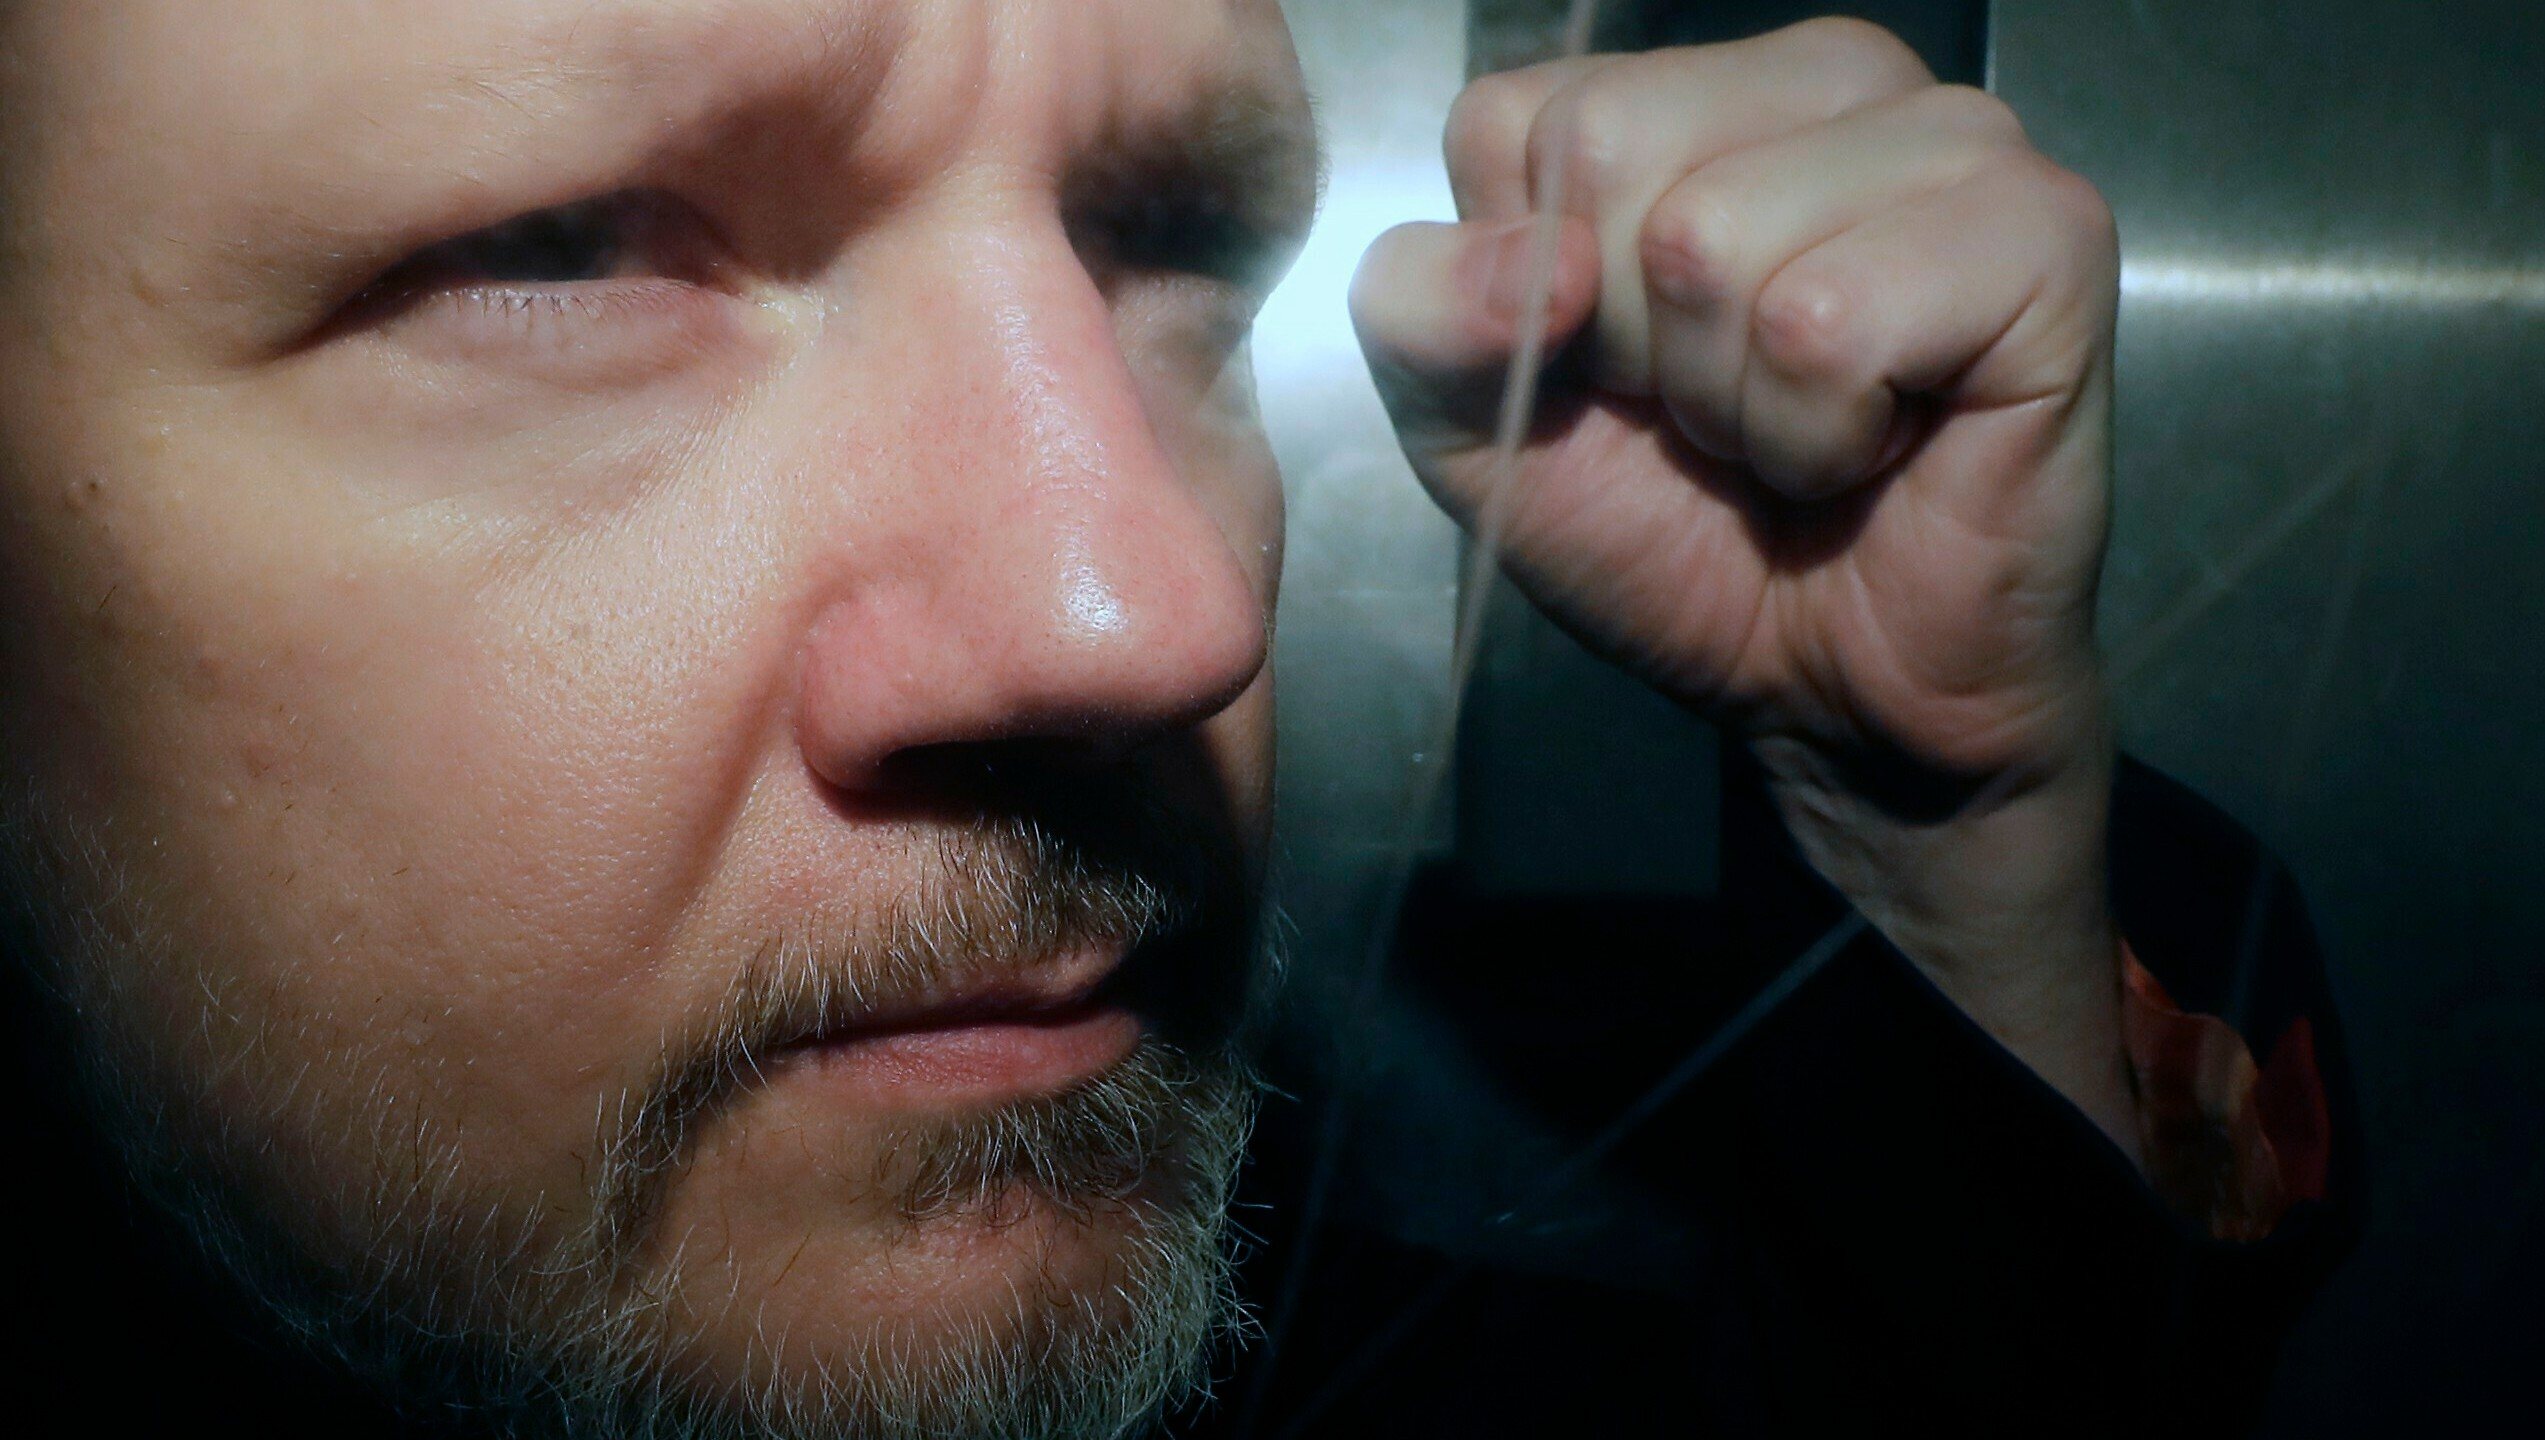 APTOPIX_Britain_WikiLeaks_Assange_45594-159532.jpg21468247